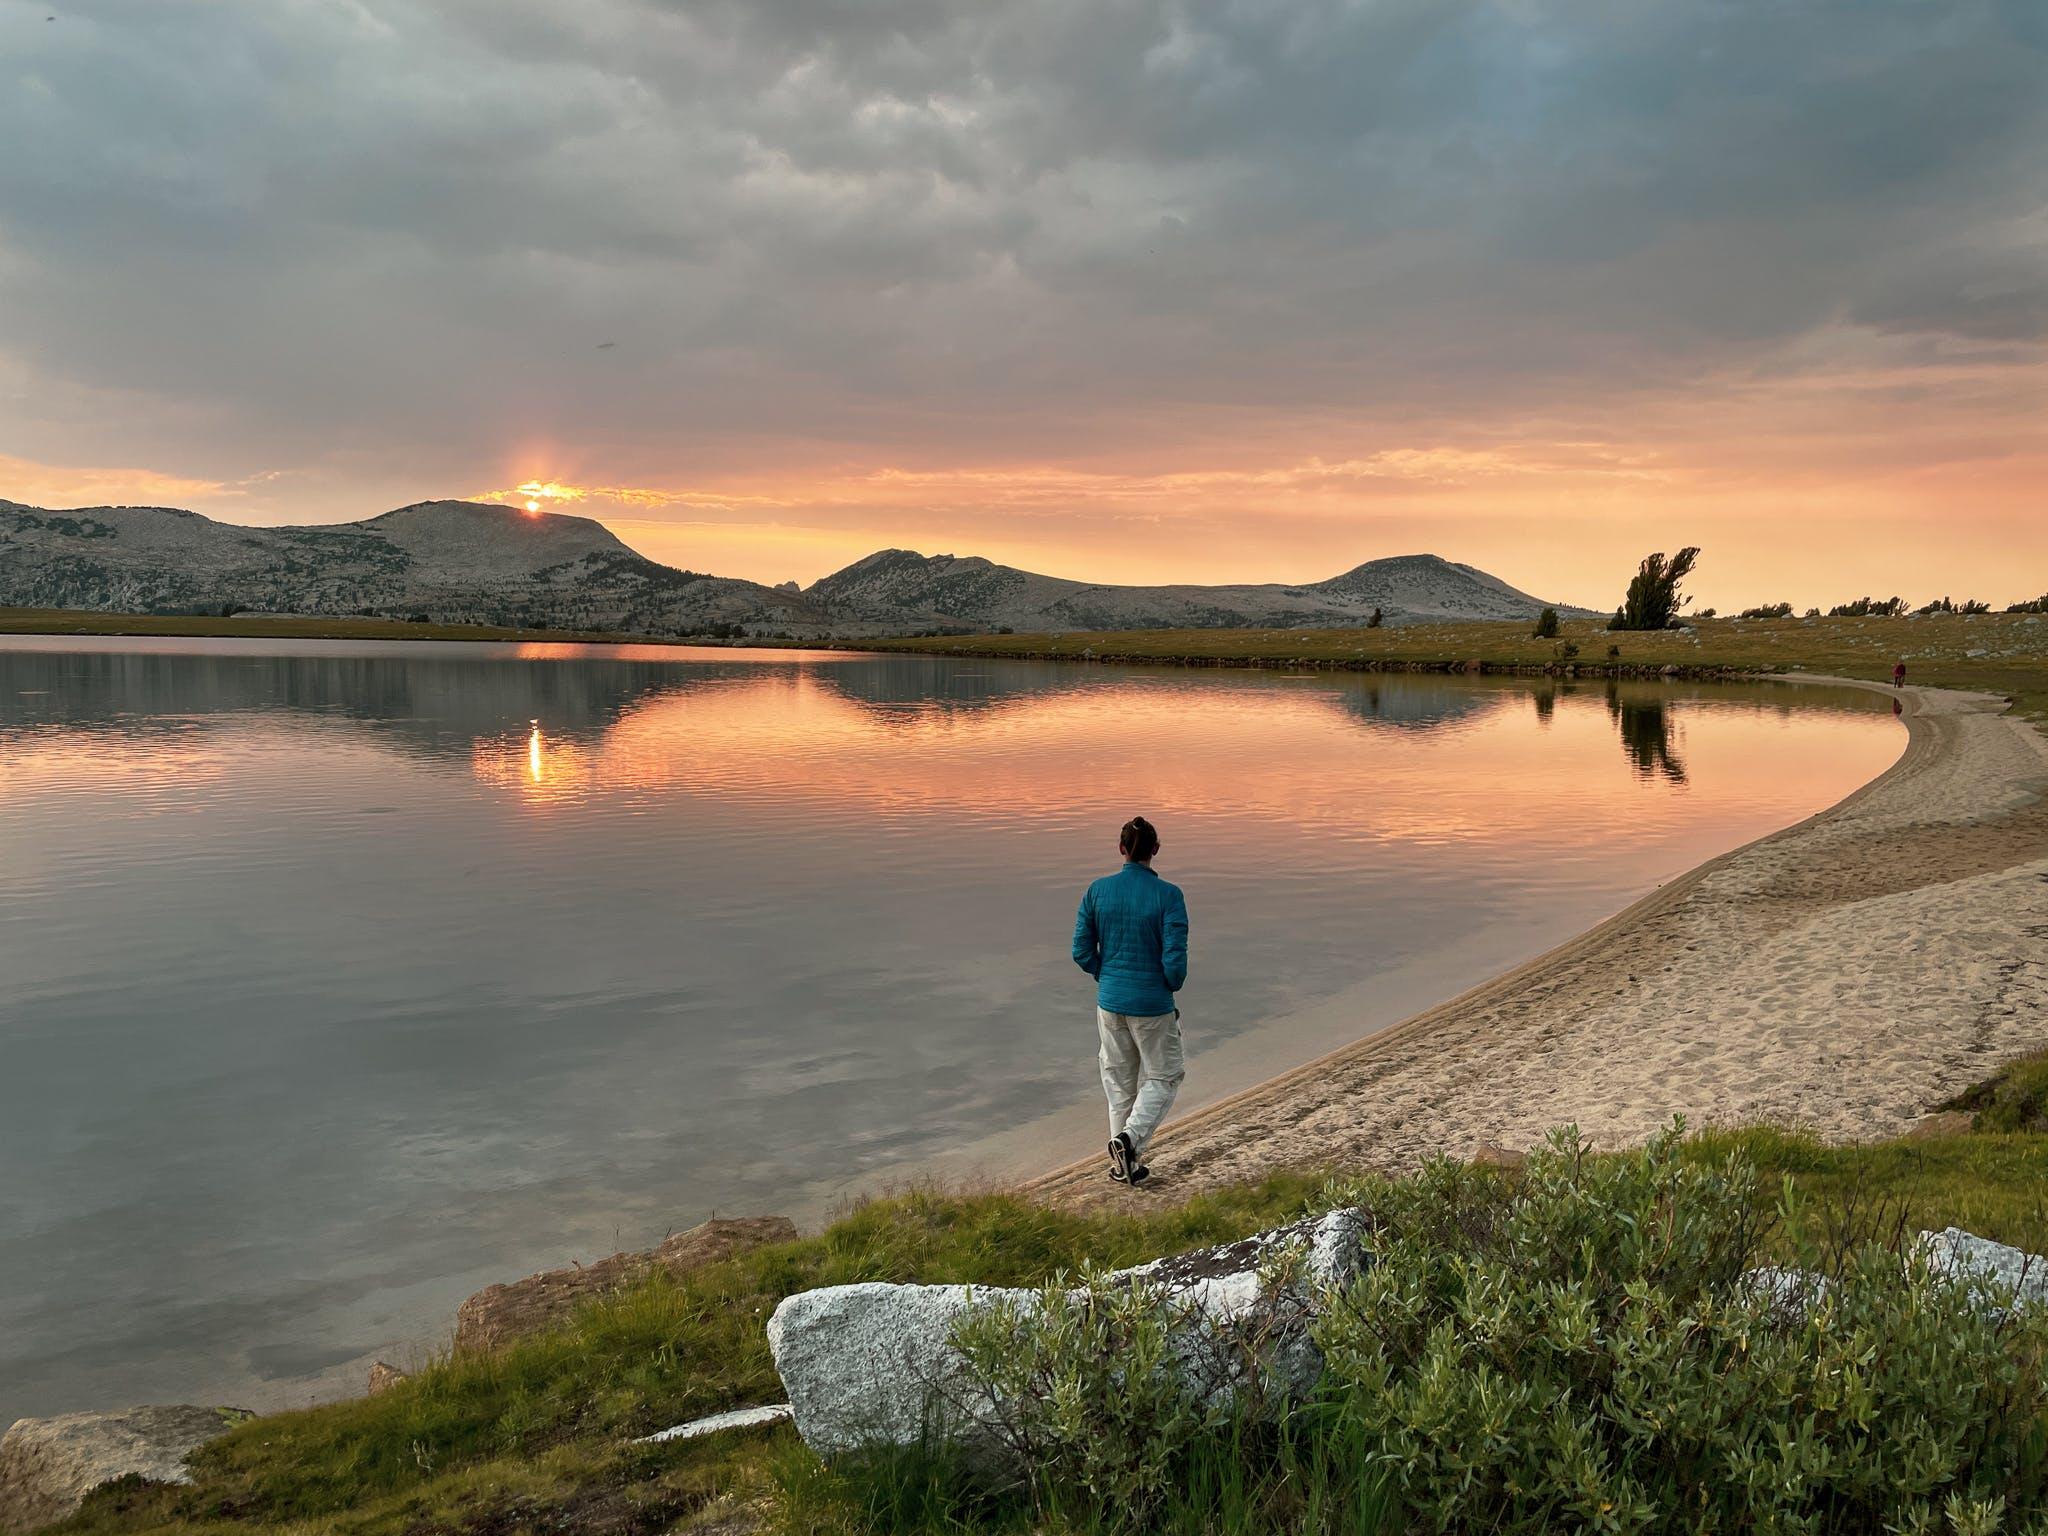 sunset camping at Evelyn Lake in Yosemite National Park